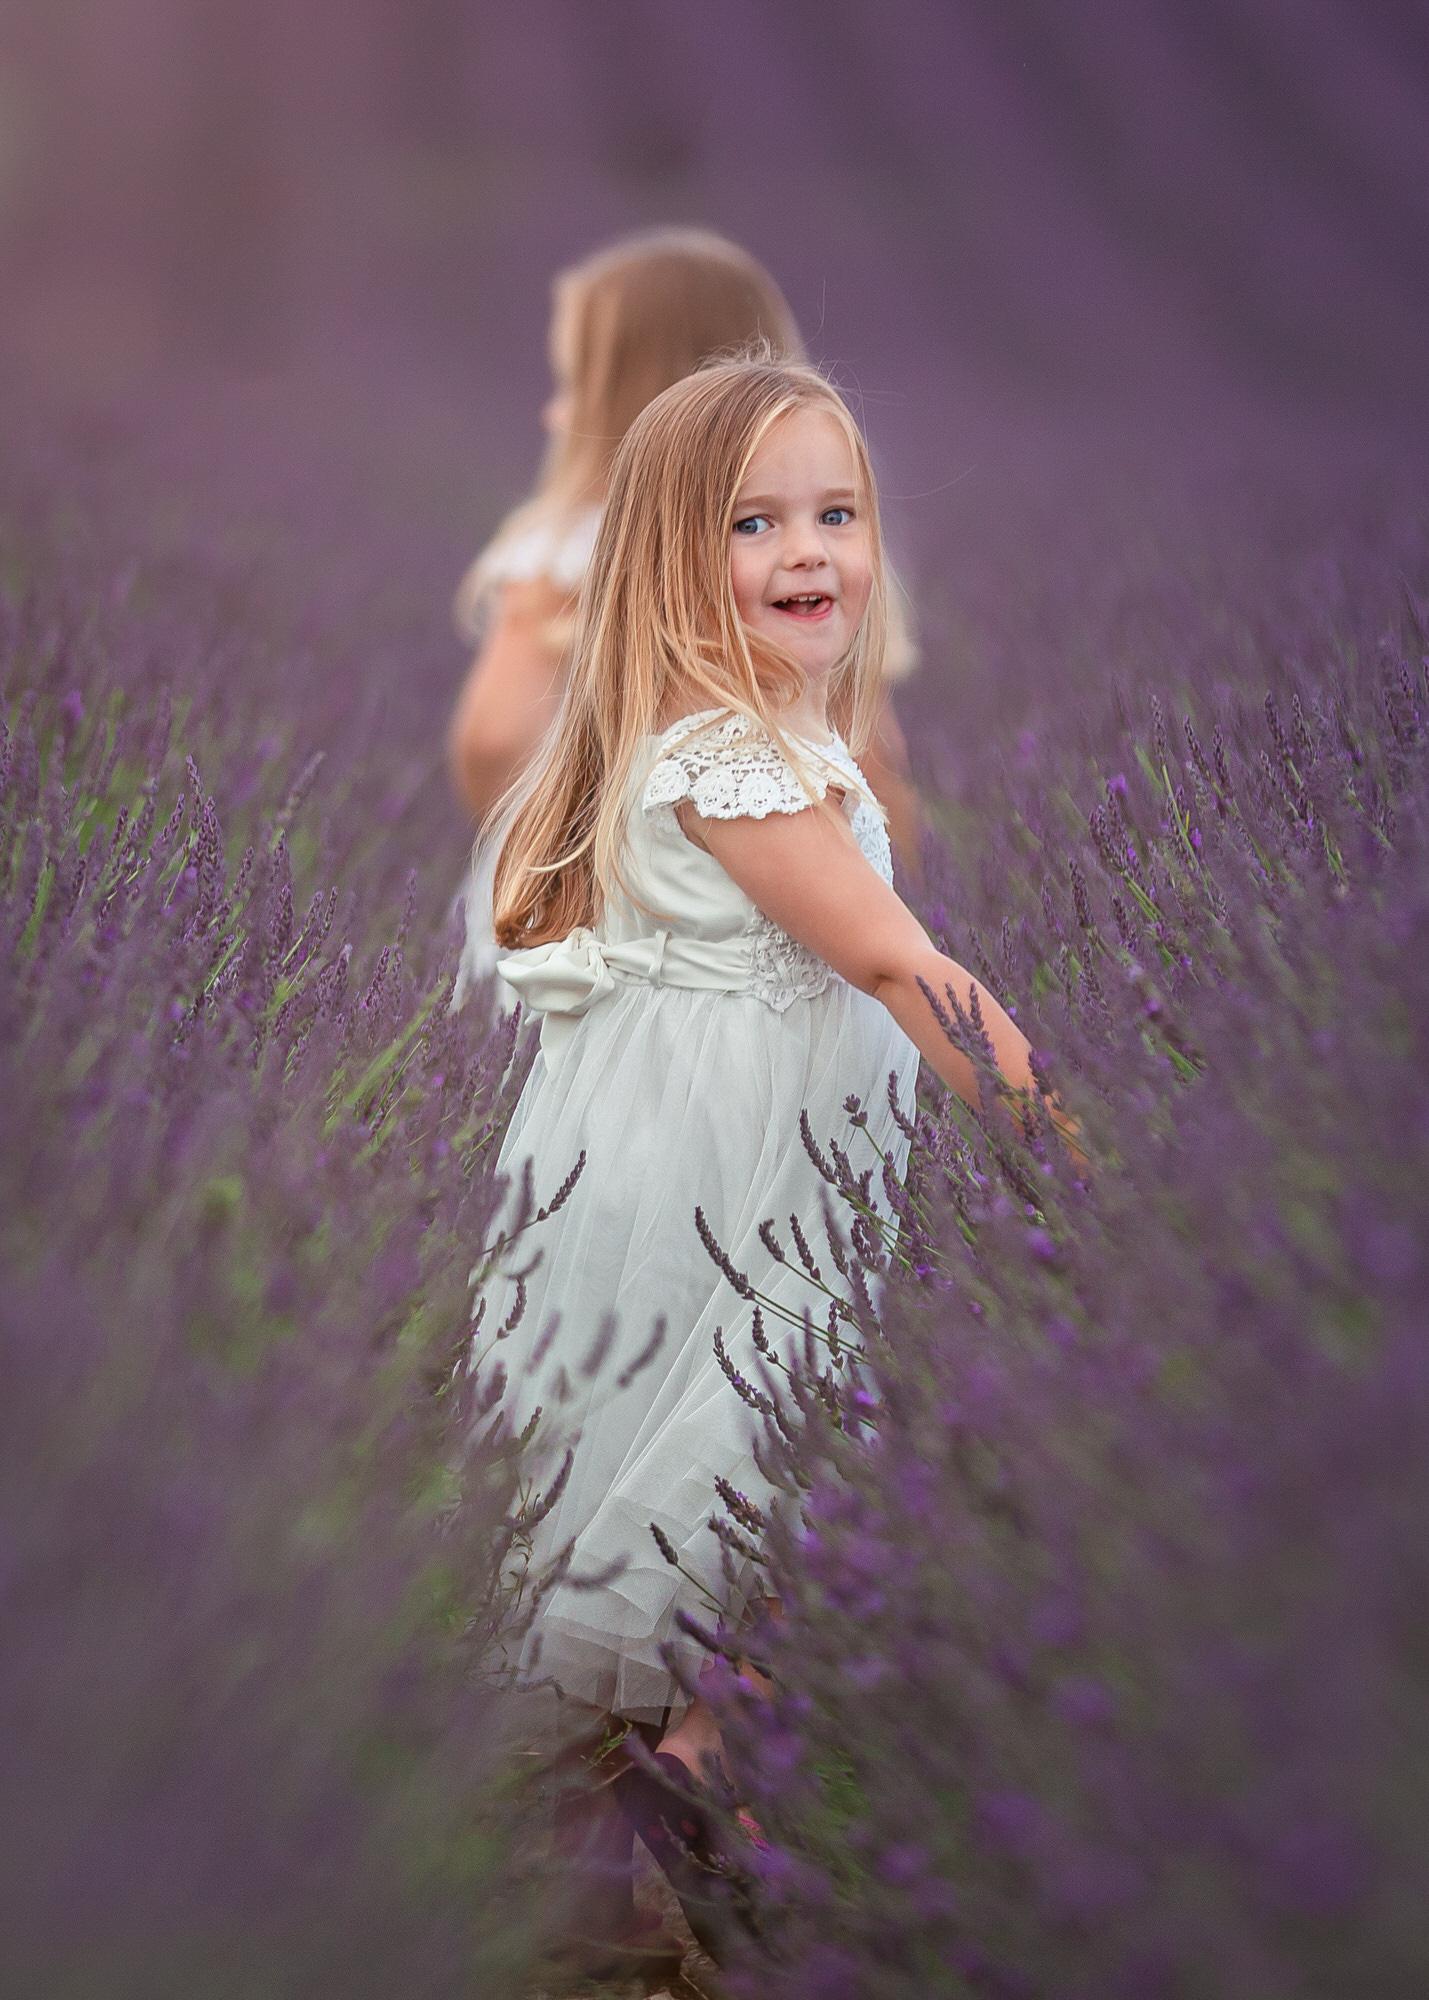 Two girls walk through HItchin lavender farm at a lavender photo shoot in hertfordshire